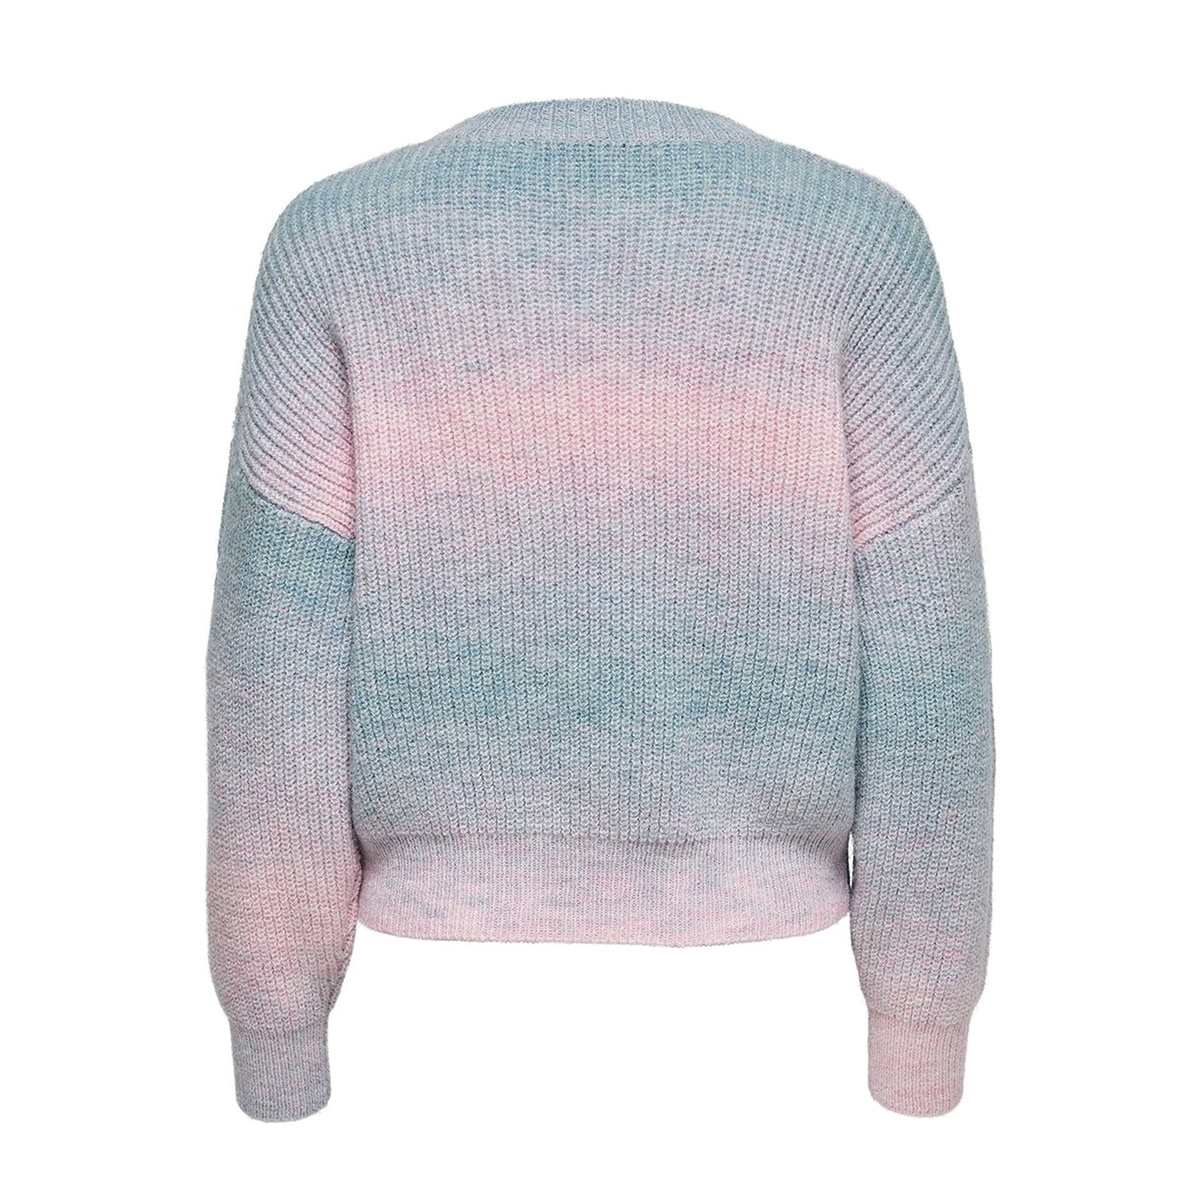 onljupiter l/s pullover ex knt 15203747 only trui winter sky/fragant